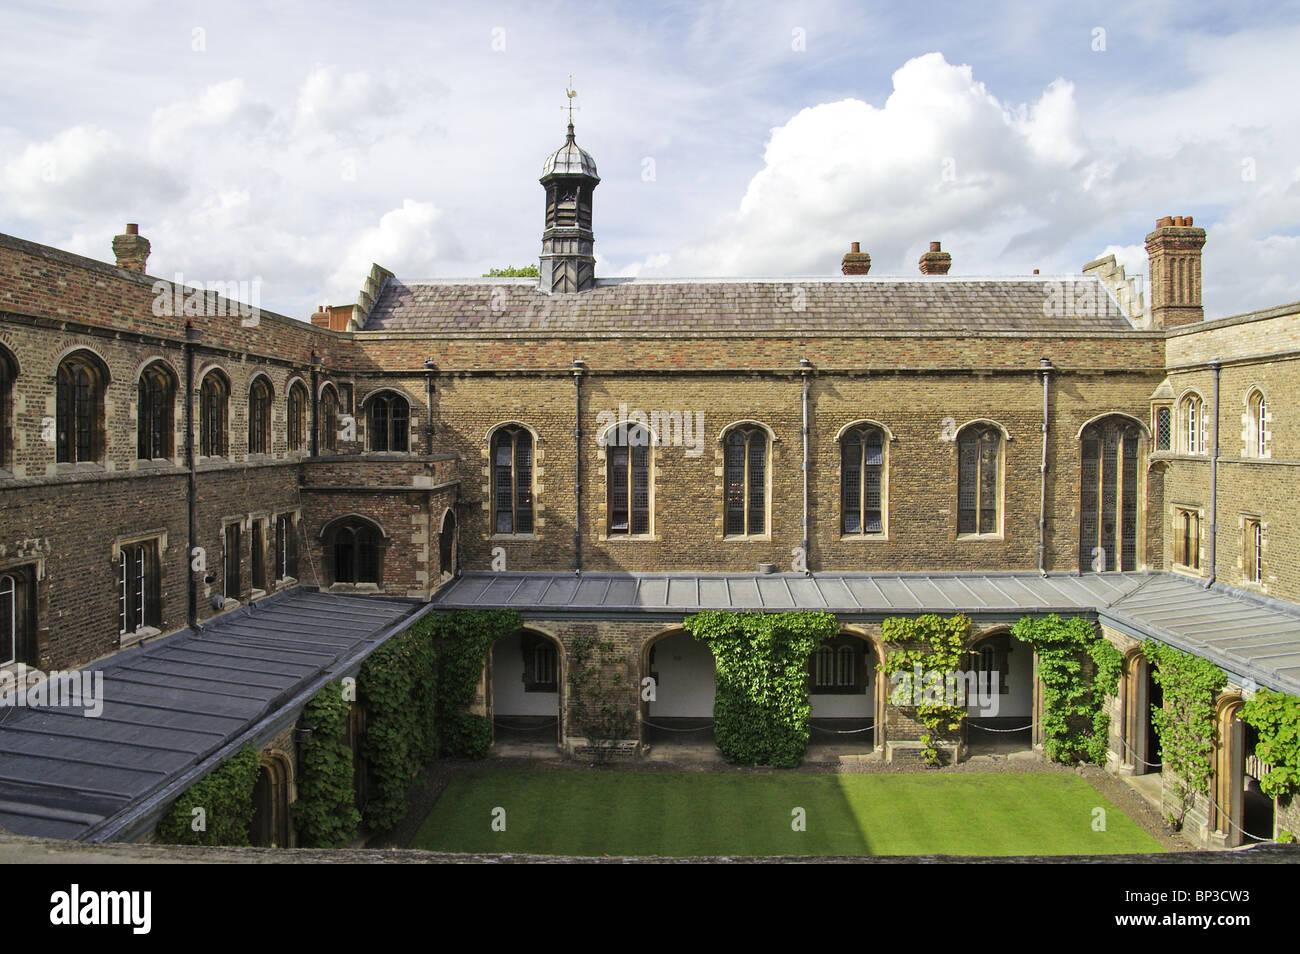 Cloister Court  Jesus College Cambridge - Stock Image